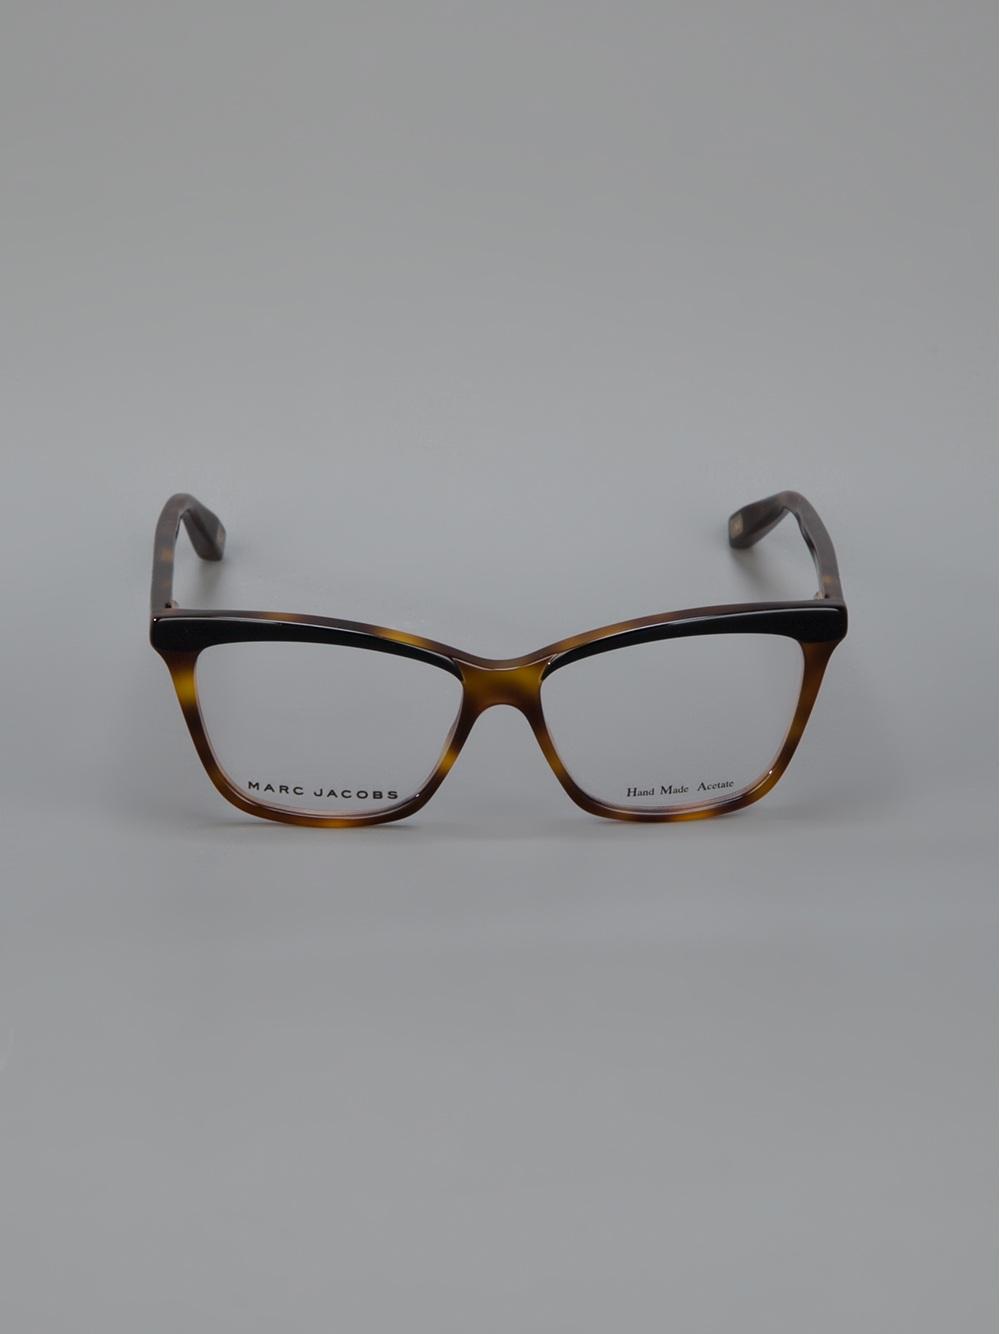 09f44965731 Lyst - Marc Jacobs Tortoise Shell Wayfarer Glasses in Brown